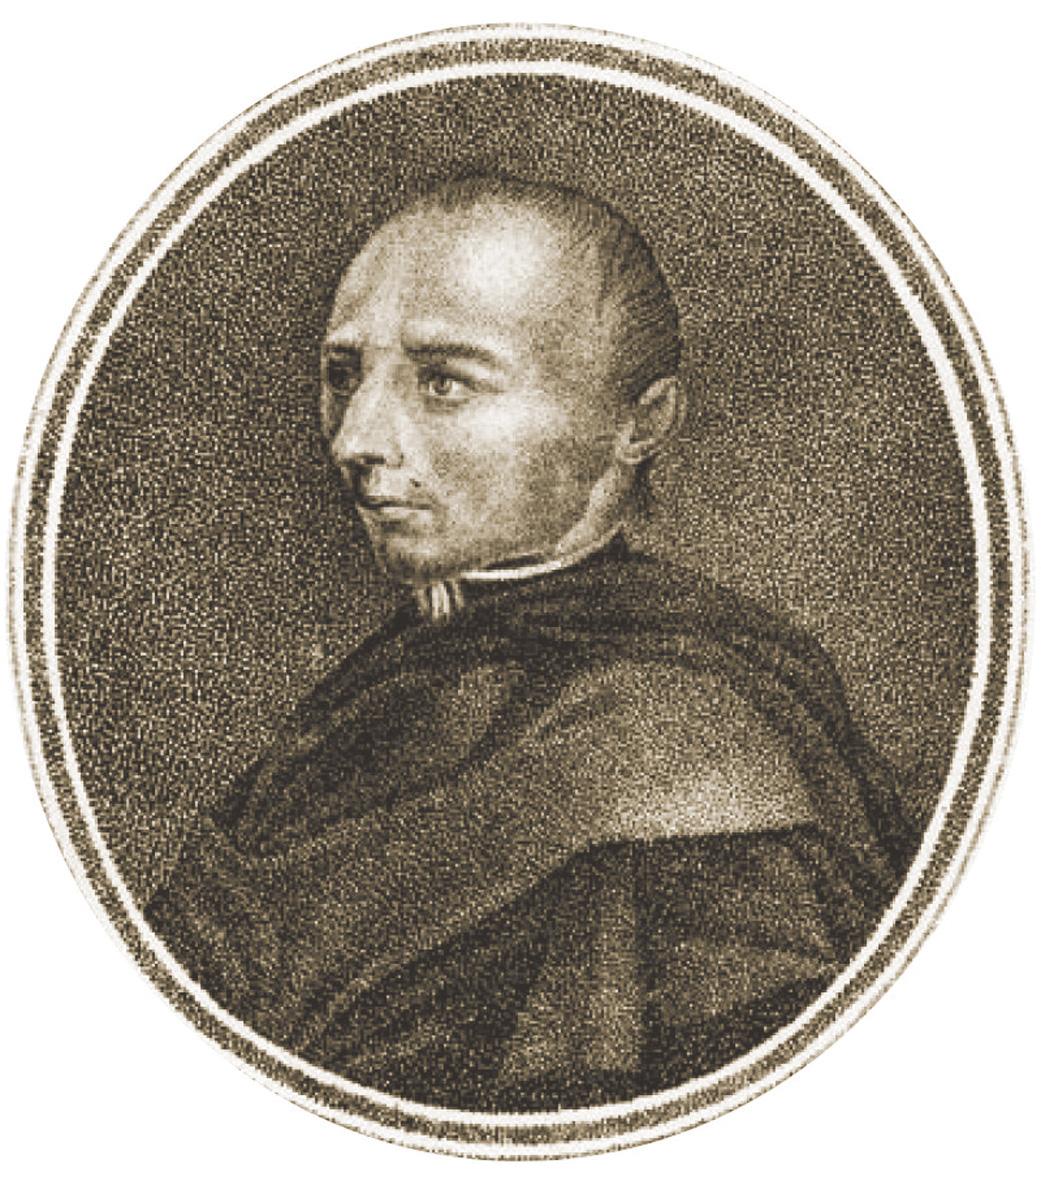 Révai Miklós